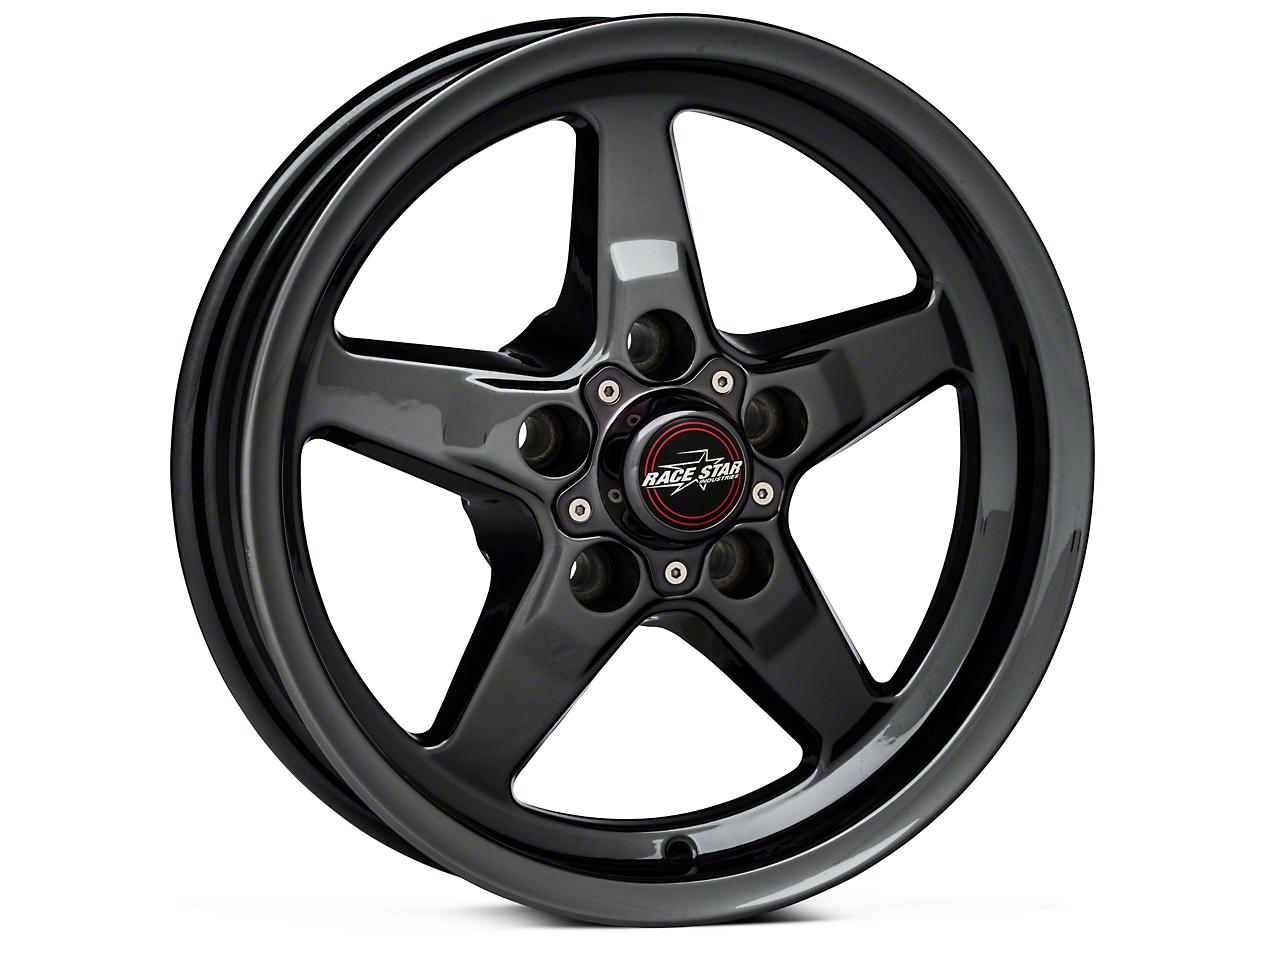 Race Star Dark Star Drag Wheel - Direct Drill - 15x3.75 (05-10 GT, V6)